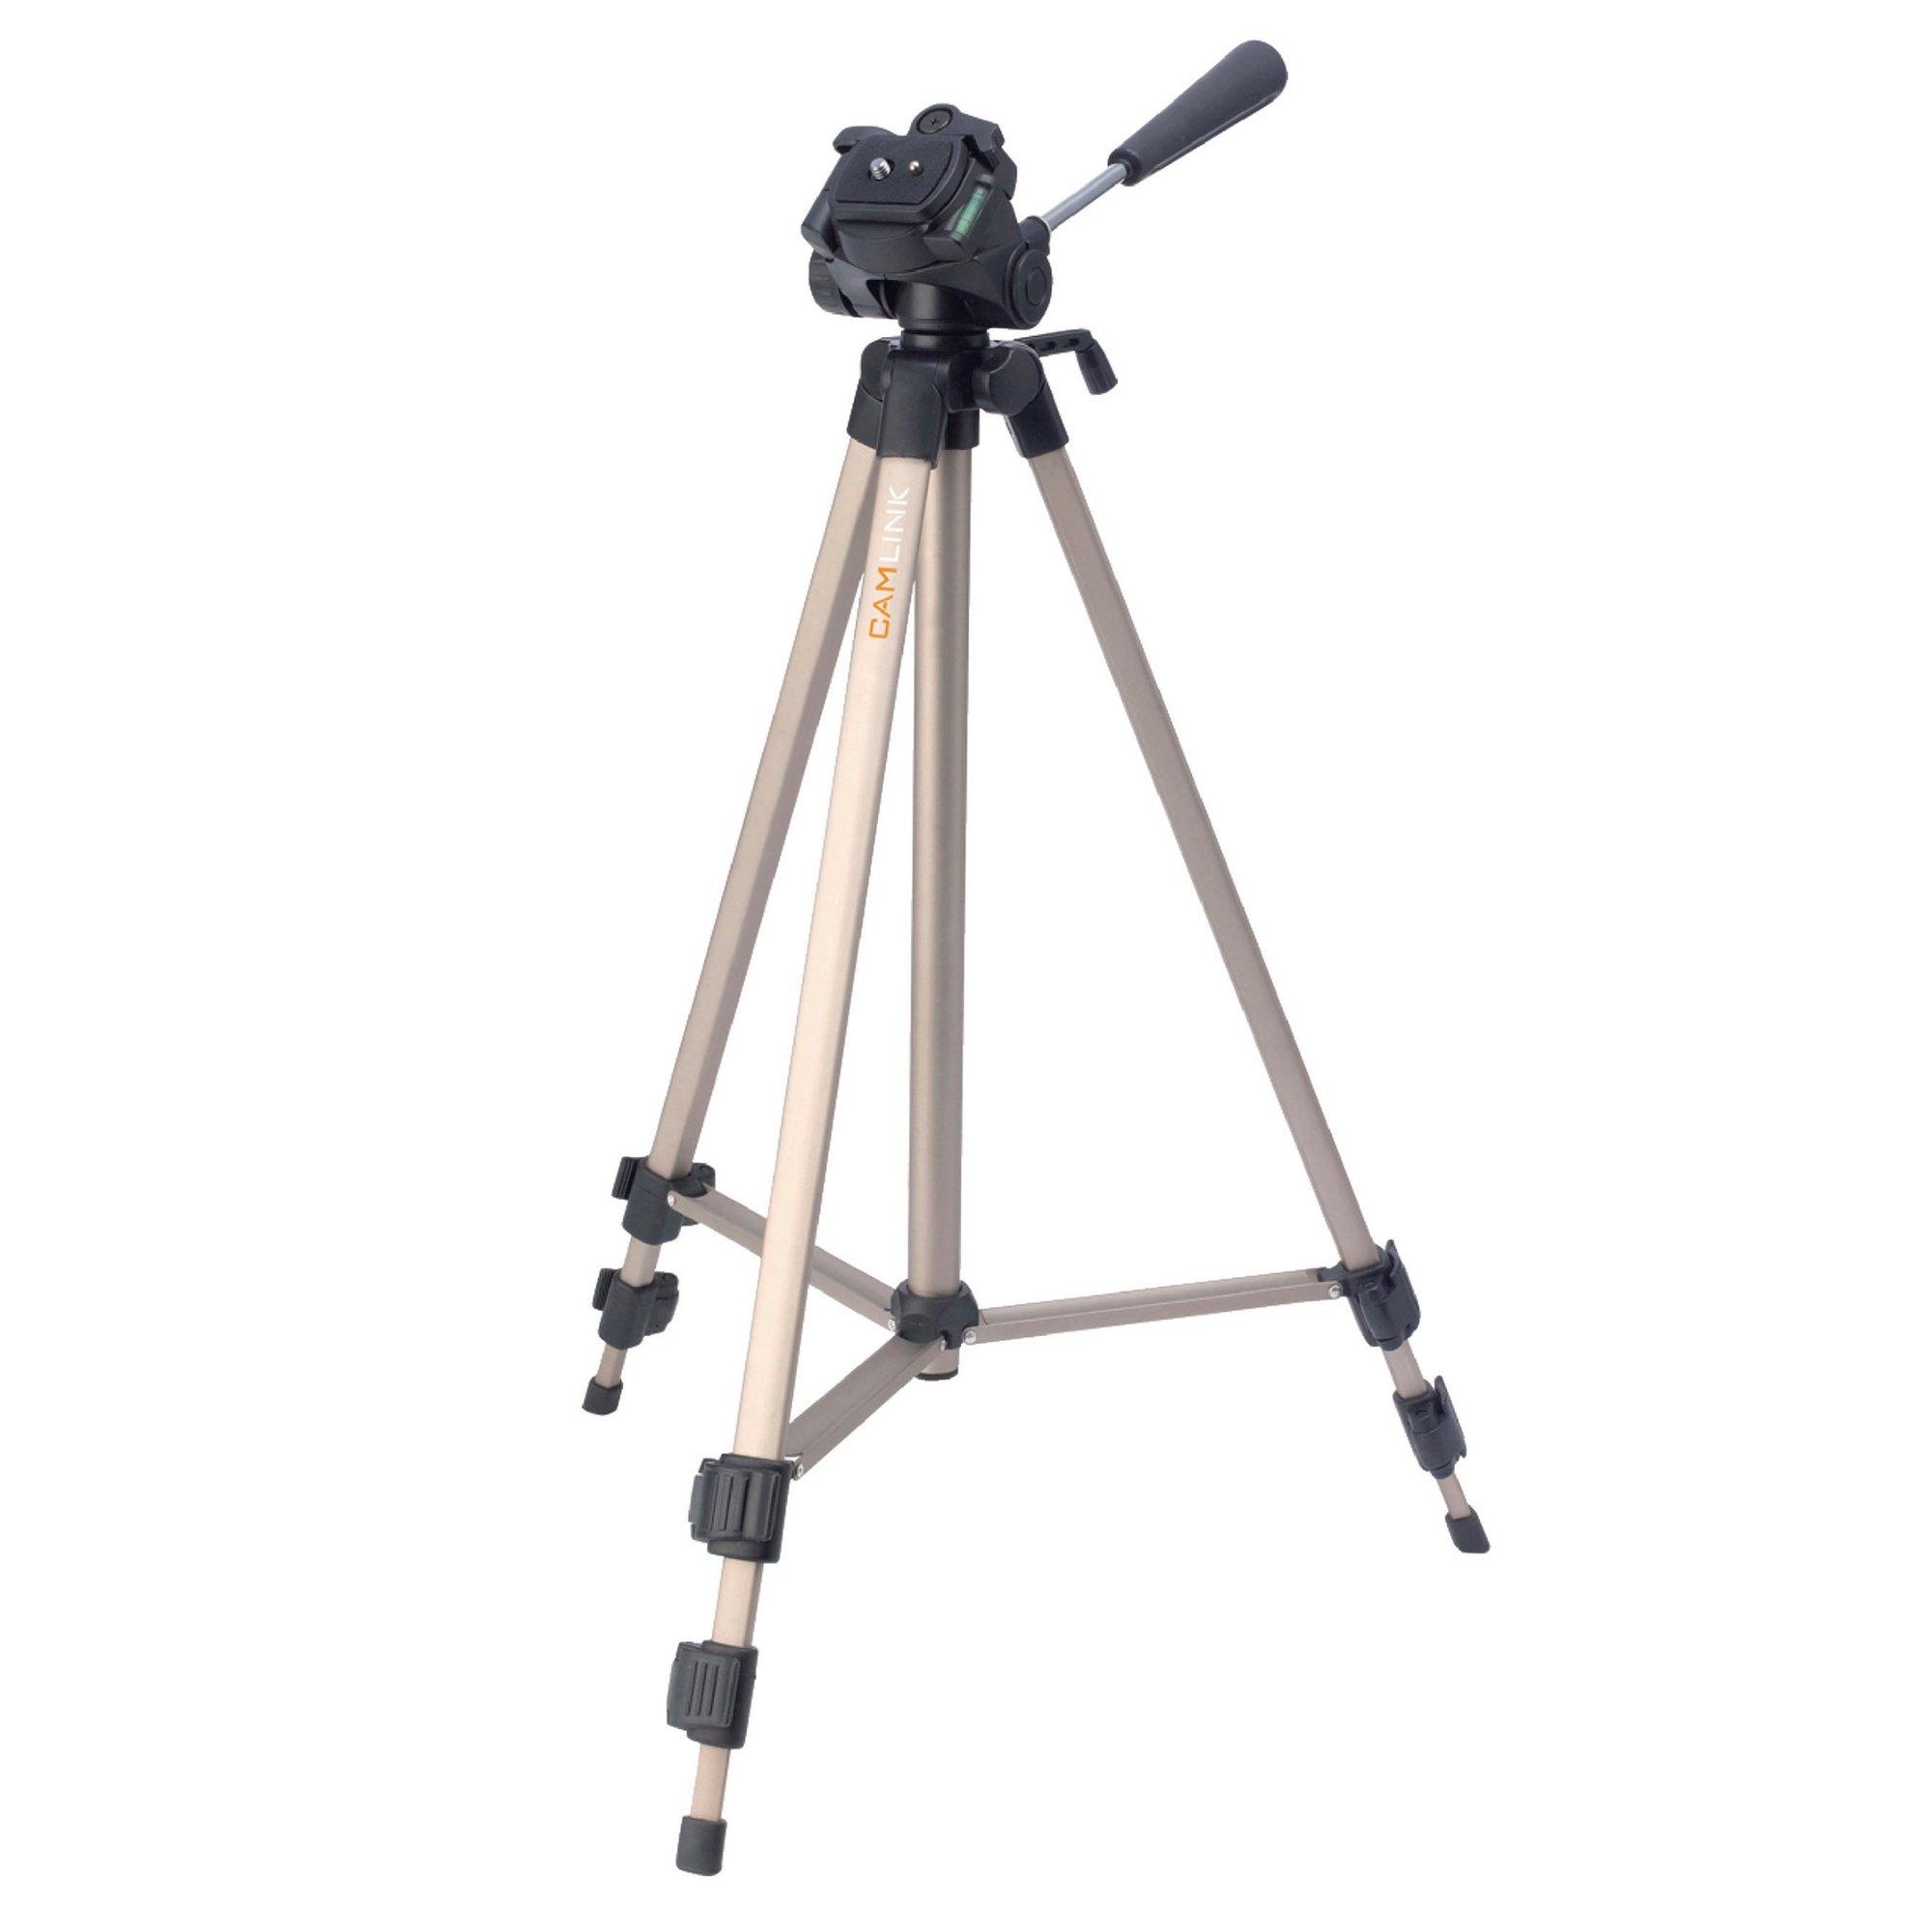 Image of Photo Video 127cm Pan and Tilt Tripod